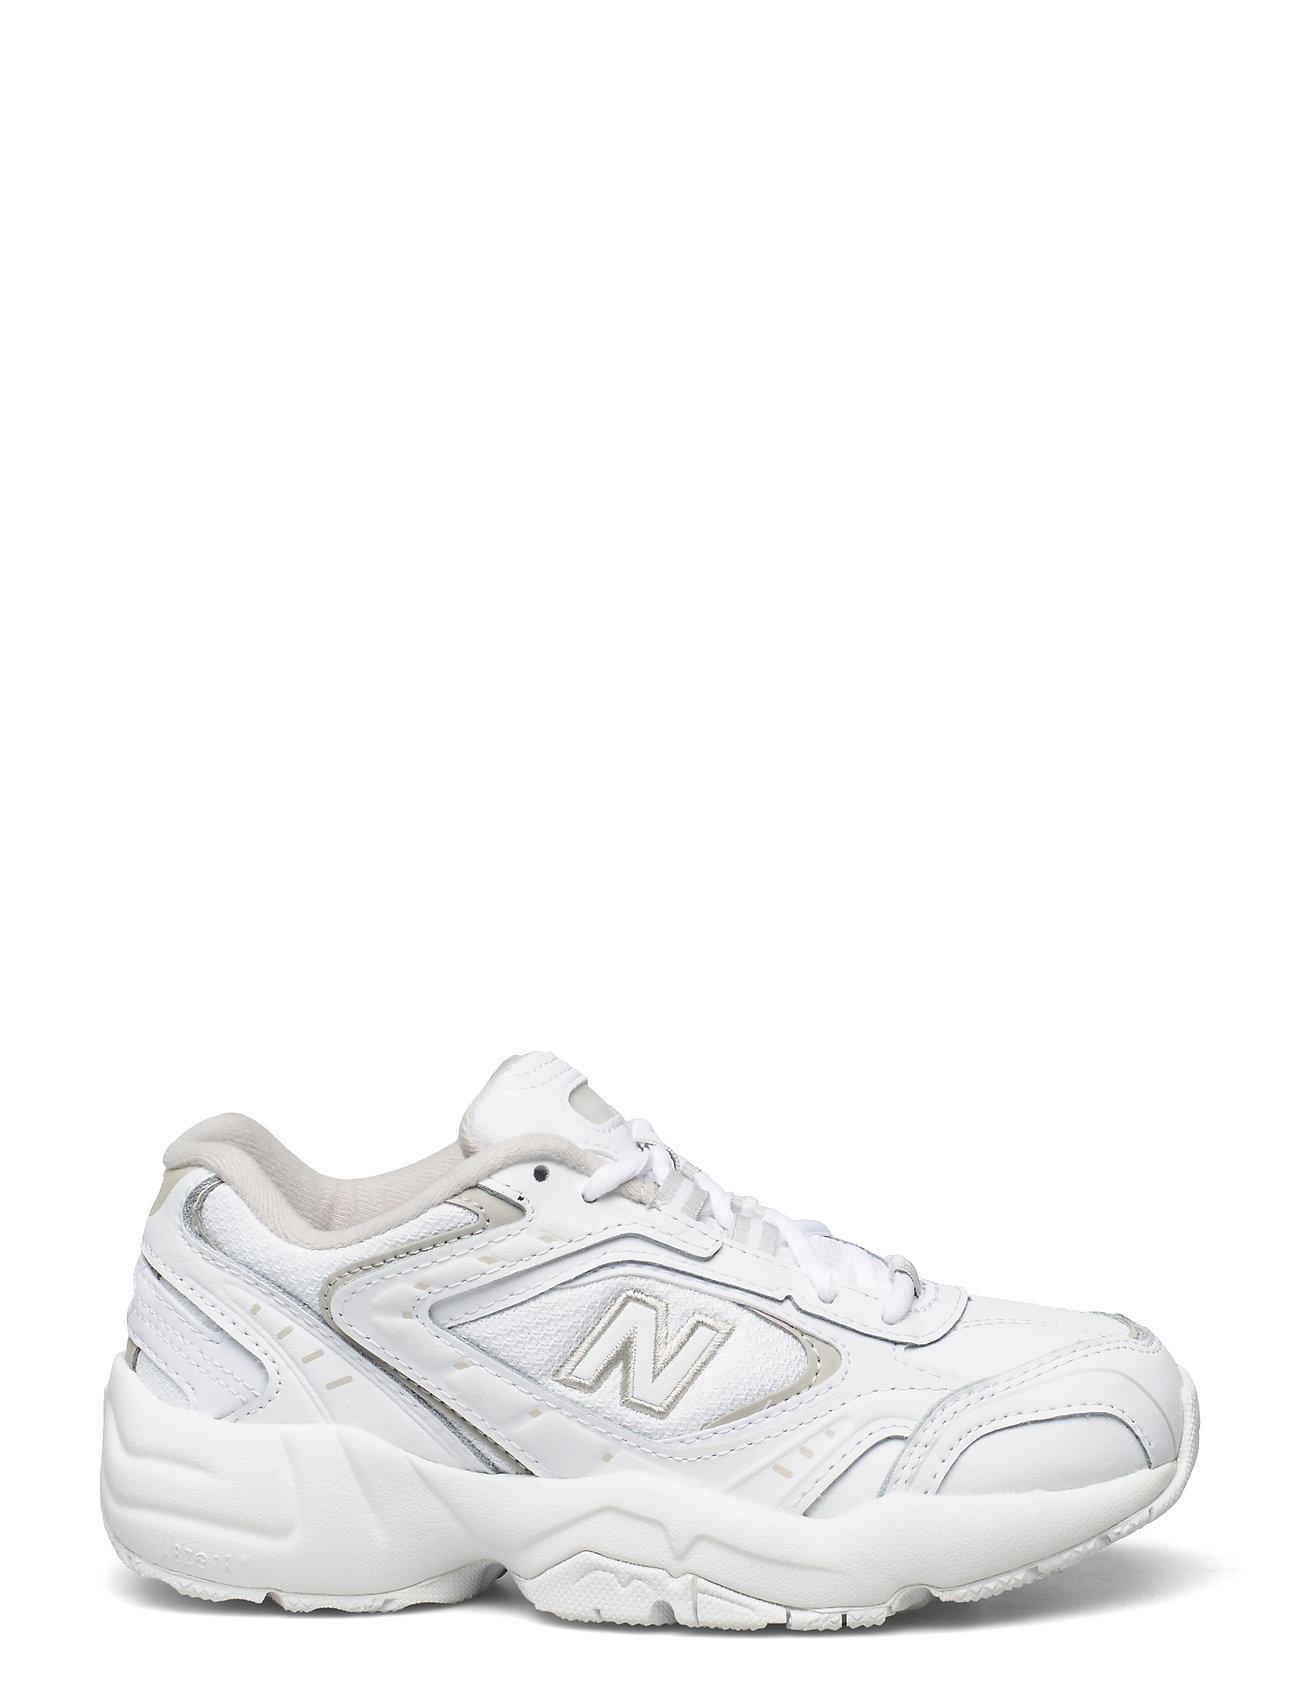 New Balance - WX452SG - white/grey - 4